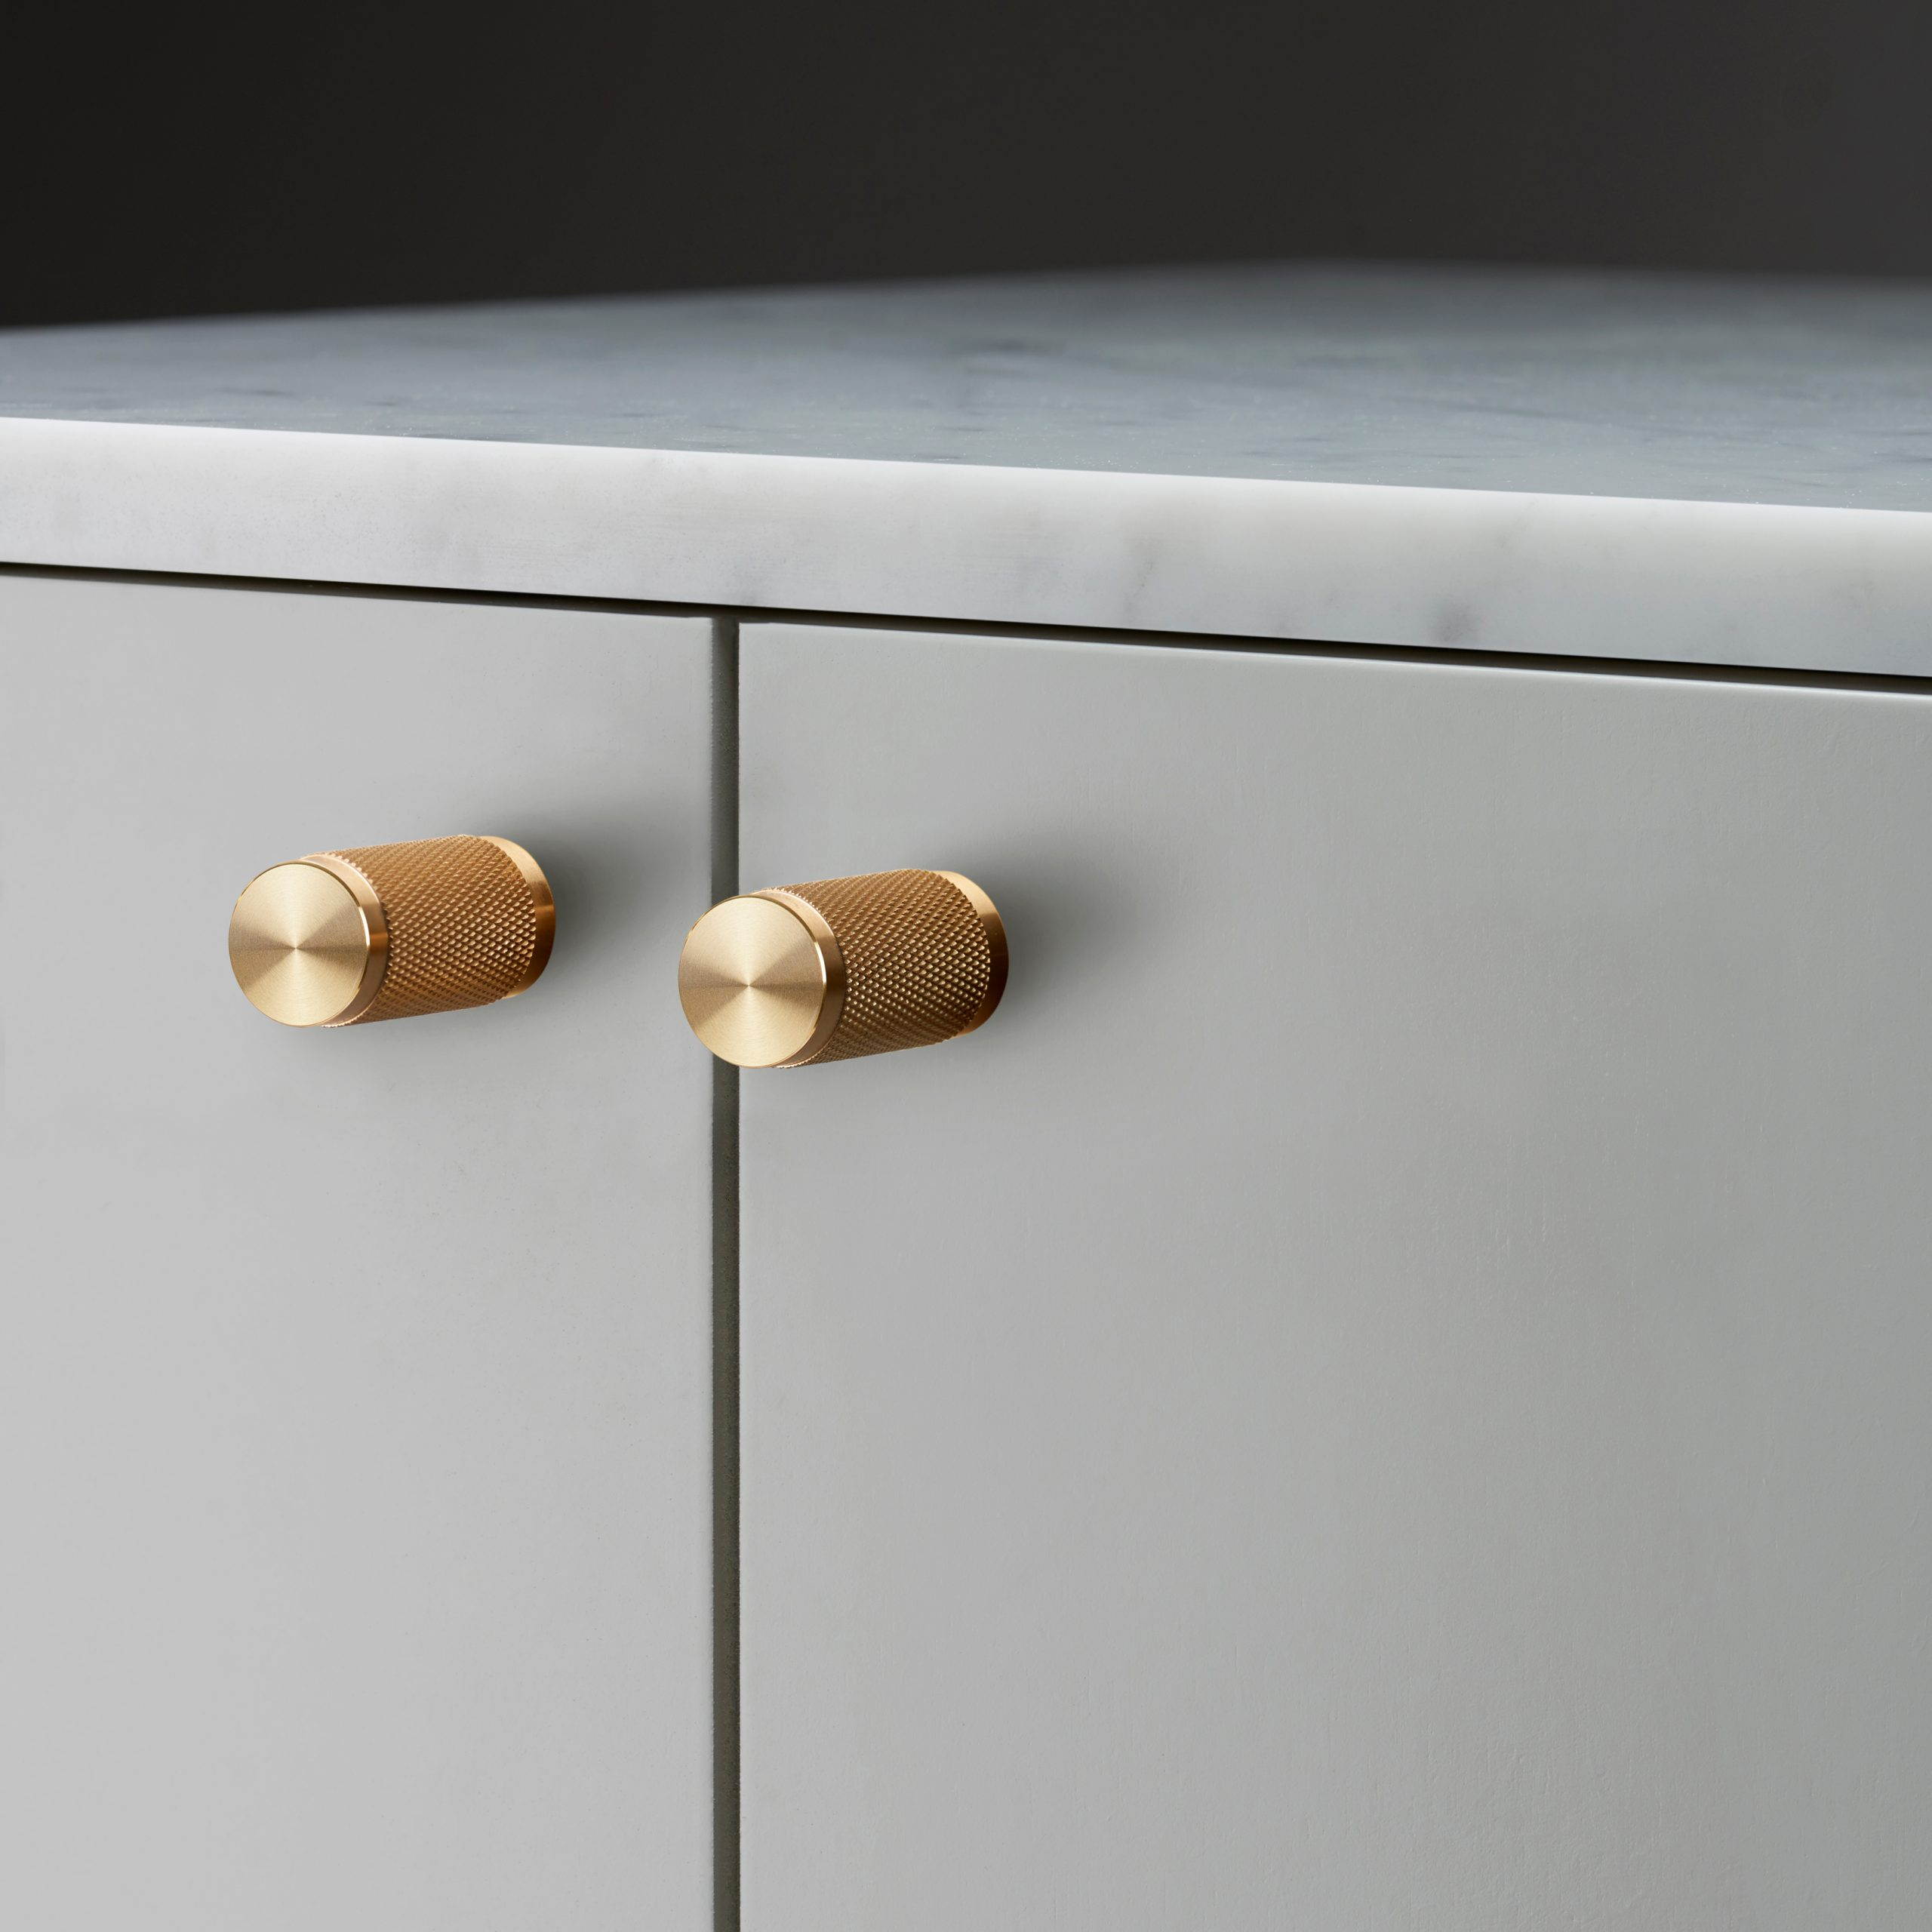 pair of furniture knobs